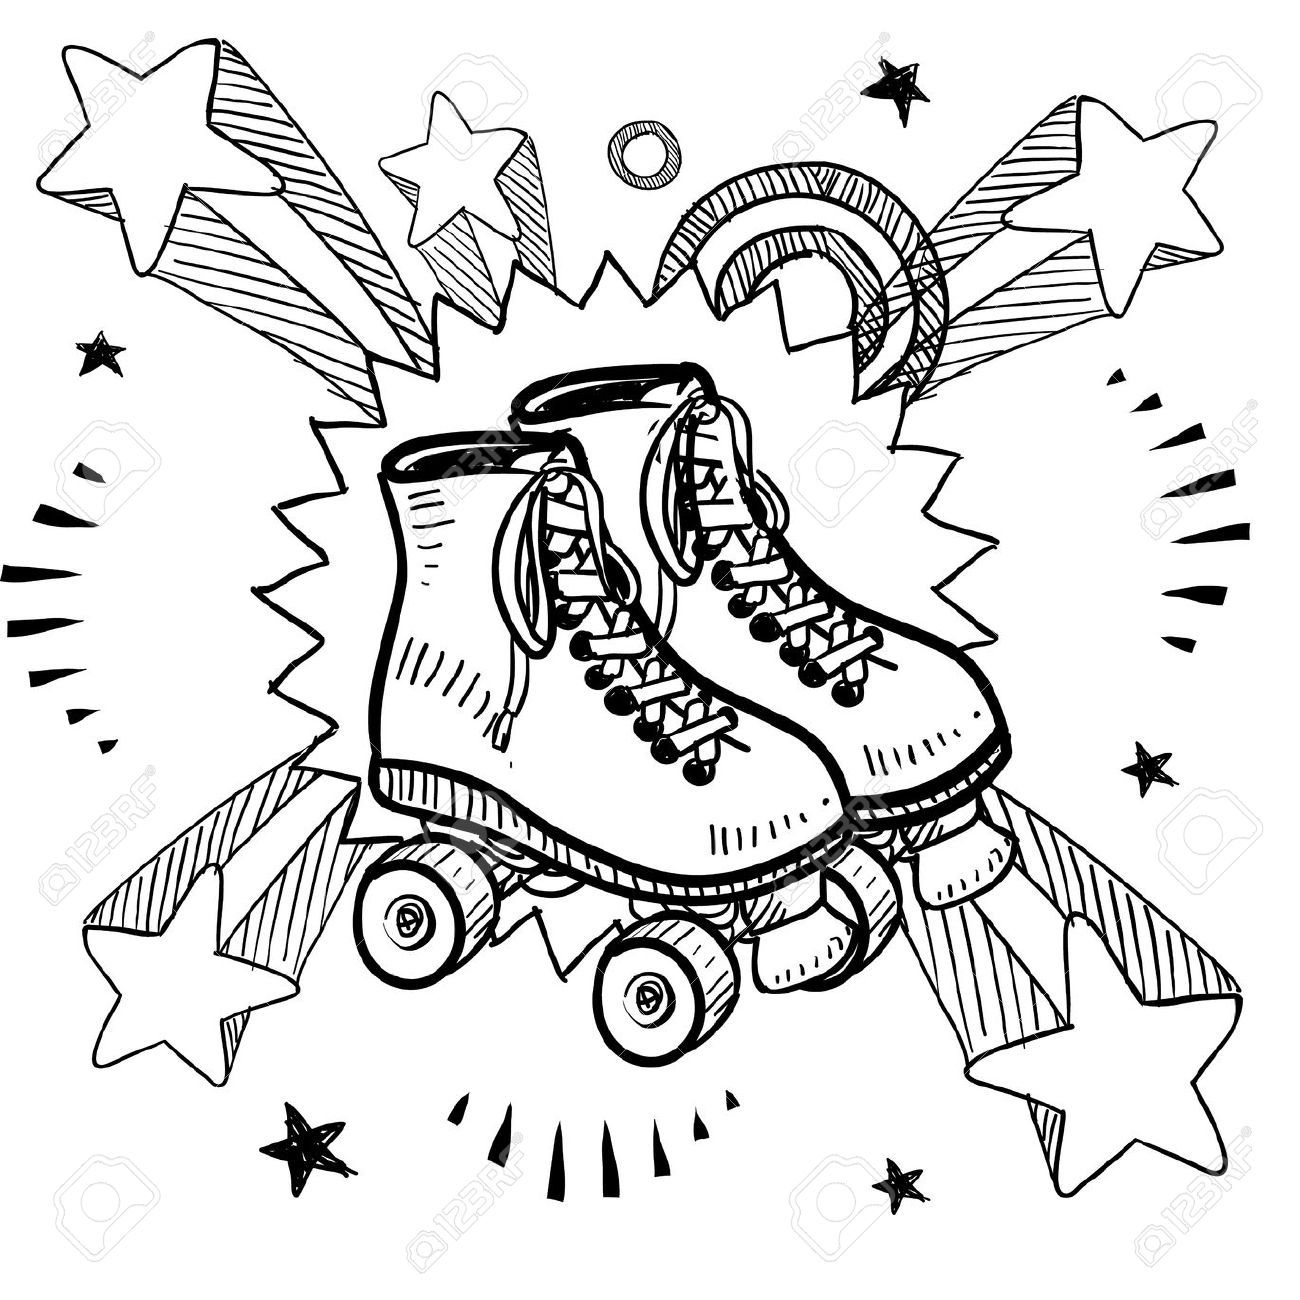 Patines  Roller derby skates, Roller derby art, Roller derby